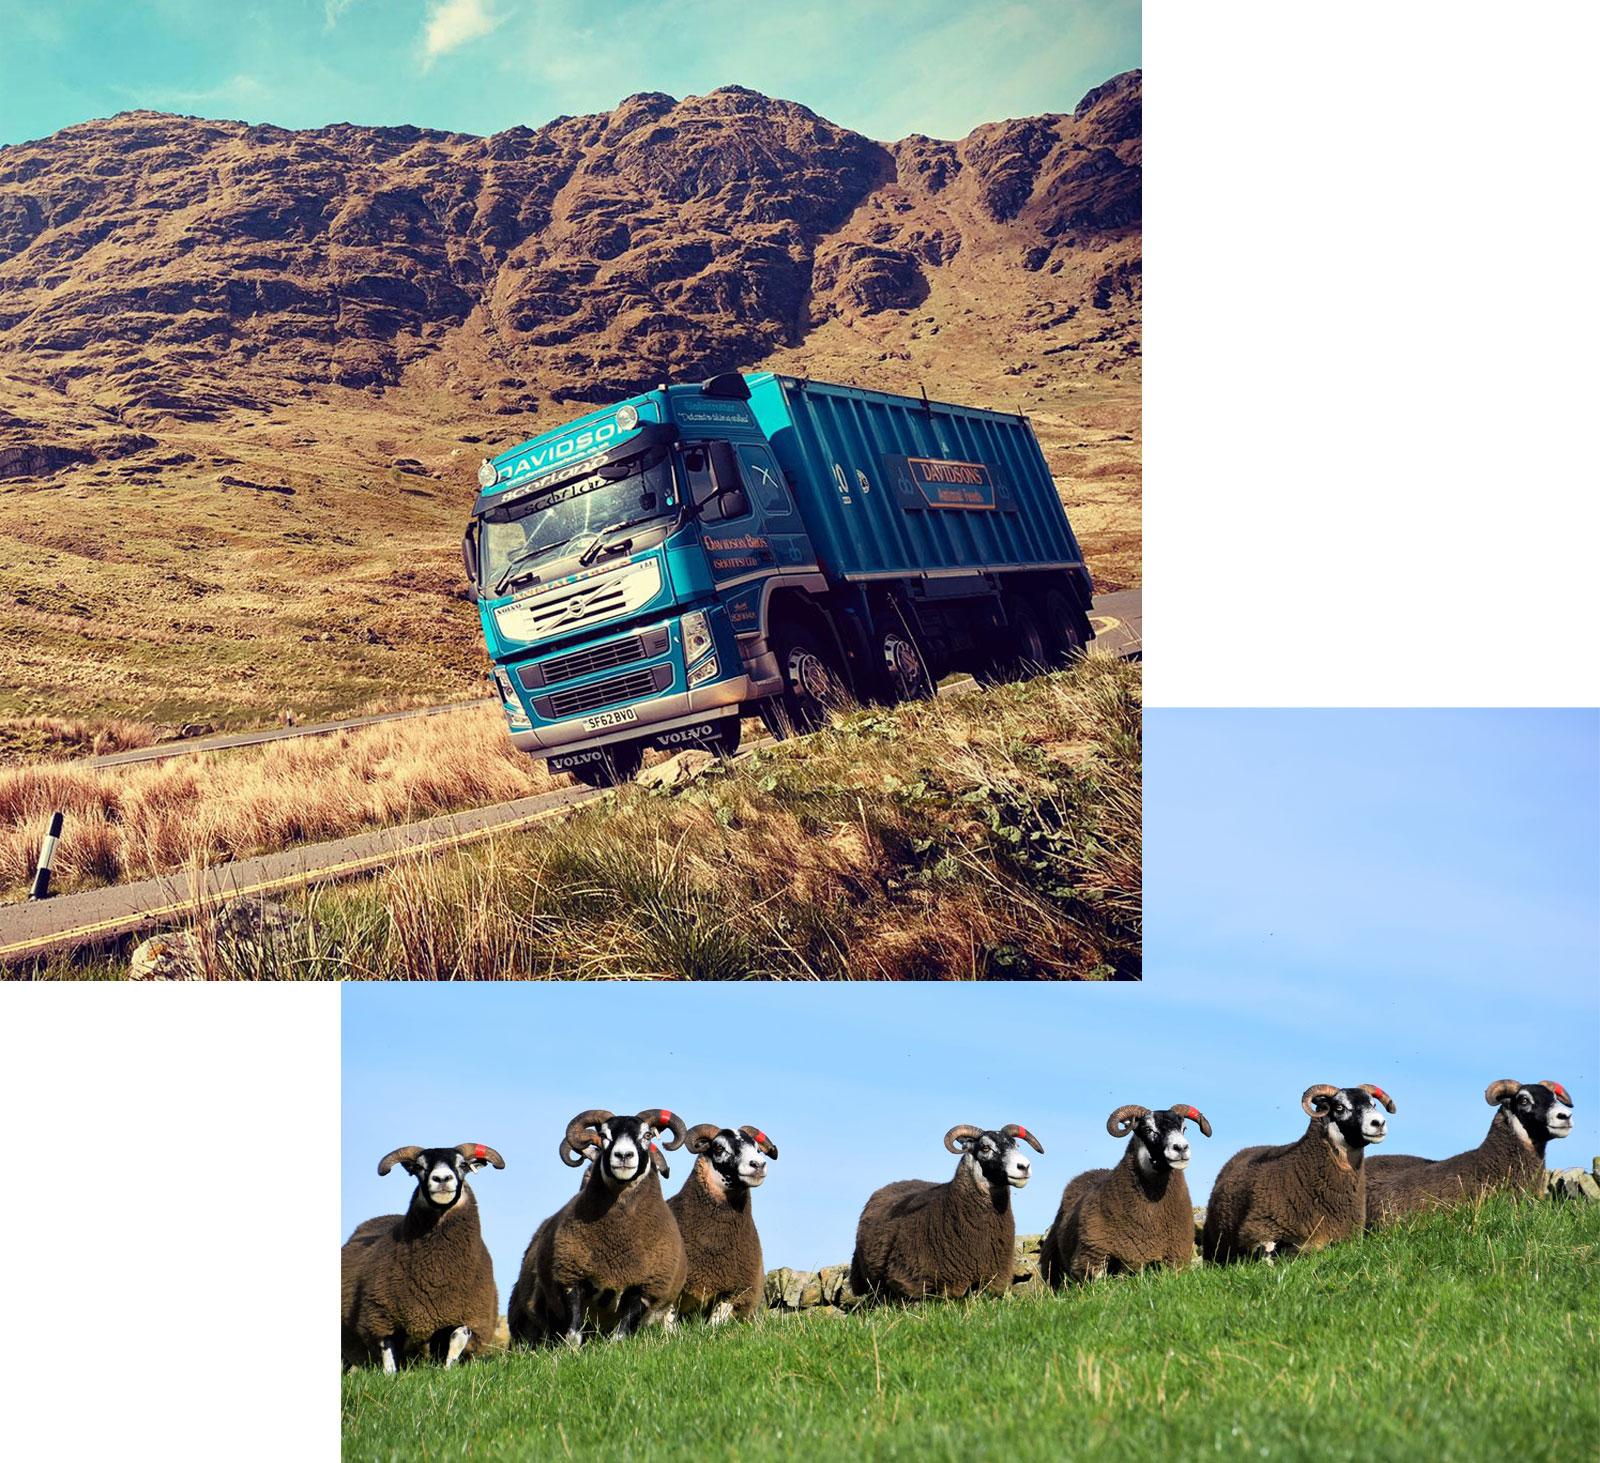 Sheep and Trucks